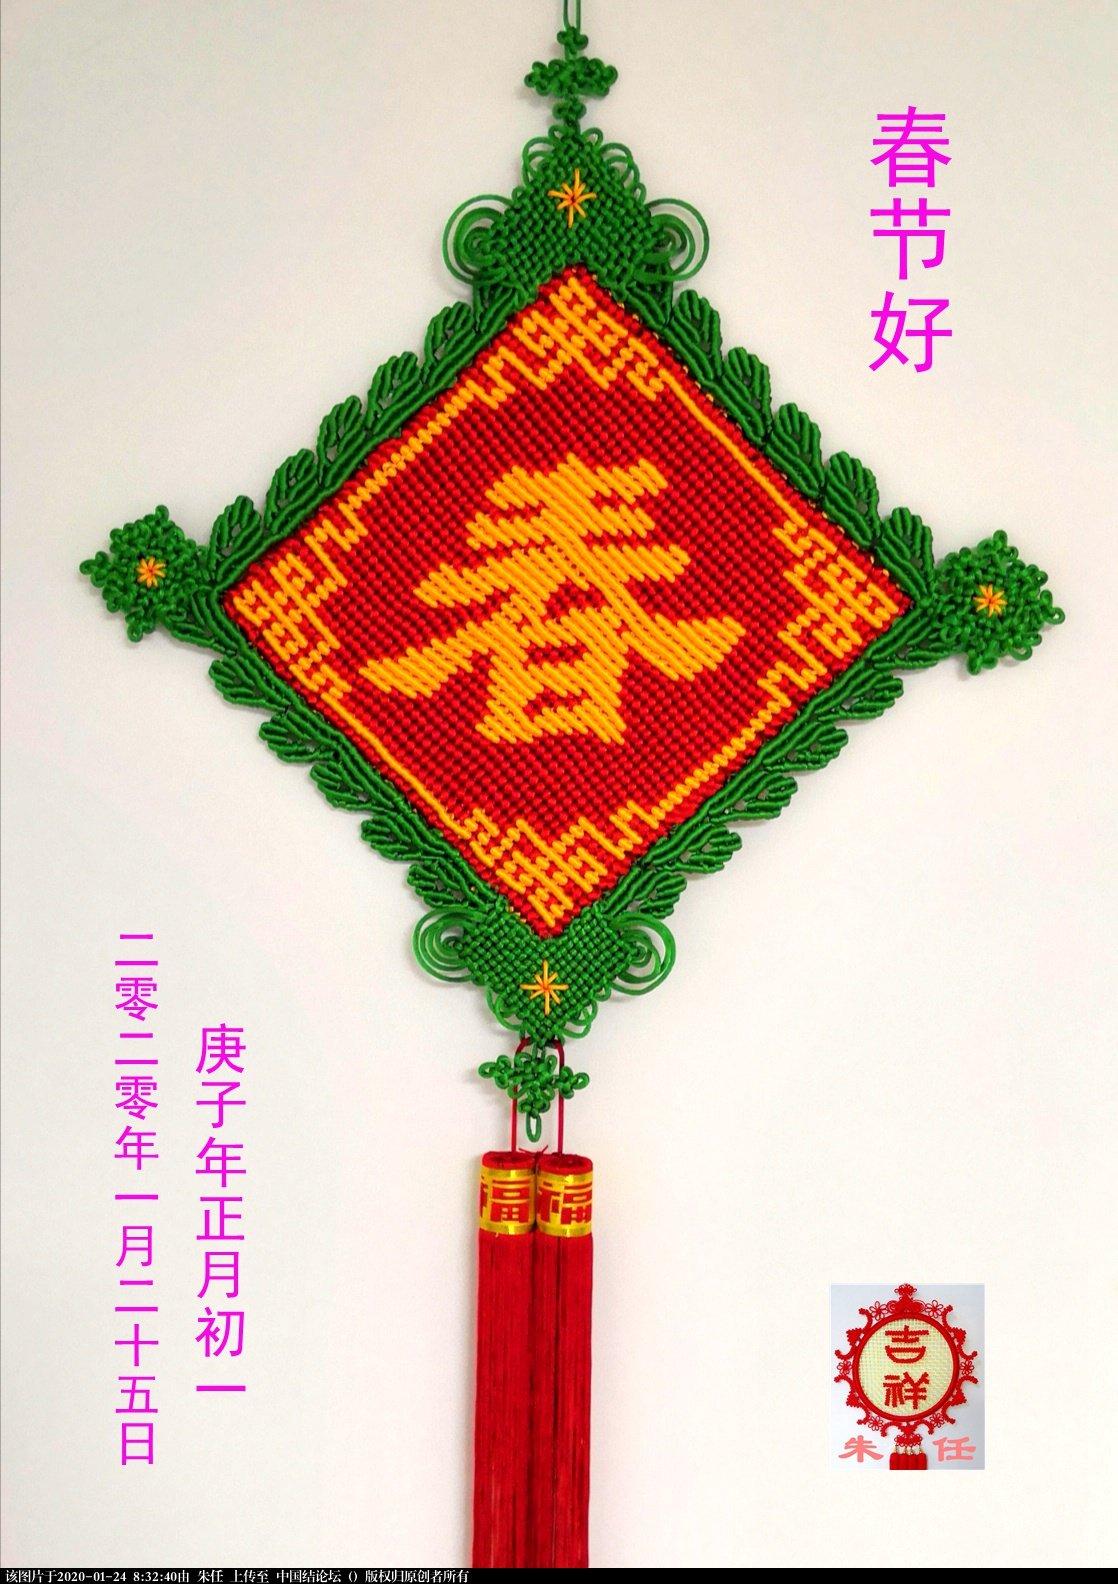 中国结论坛 春节好  作品展示 083202zitwpxtbabaaf6wp